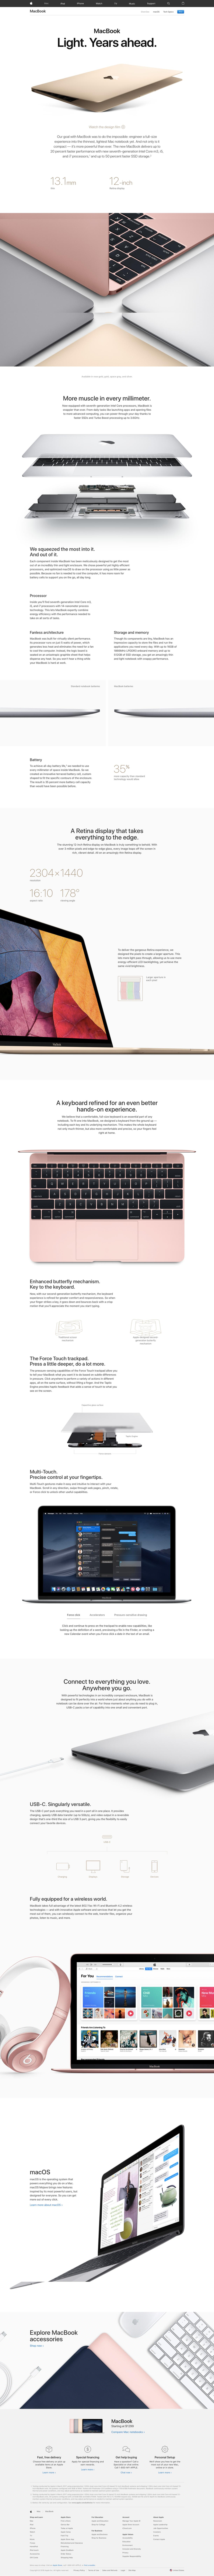 screencapture-apple-macbook-2018-09-24-16_00_47.png